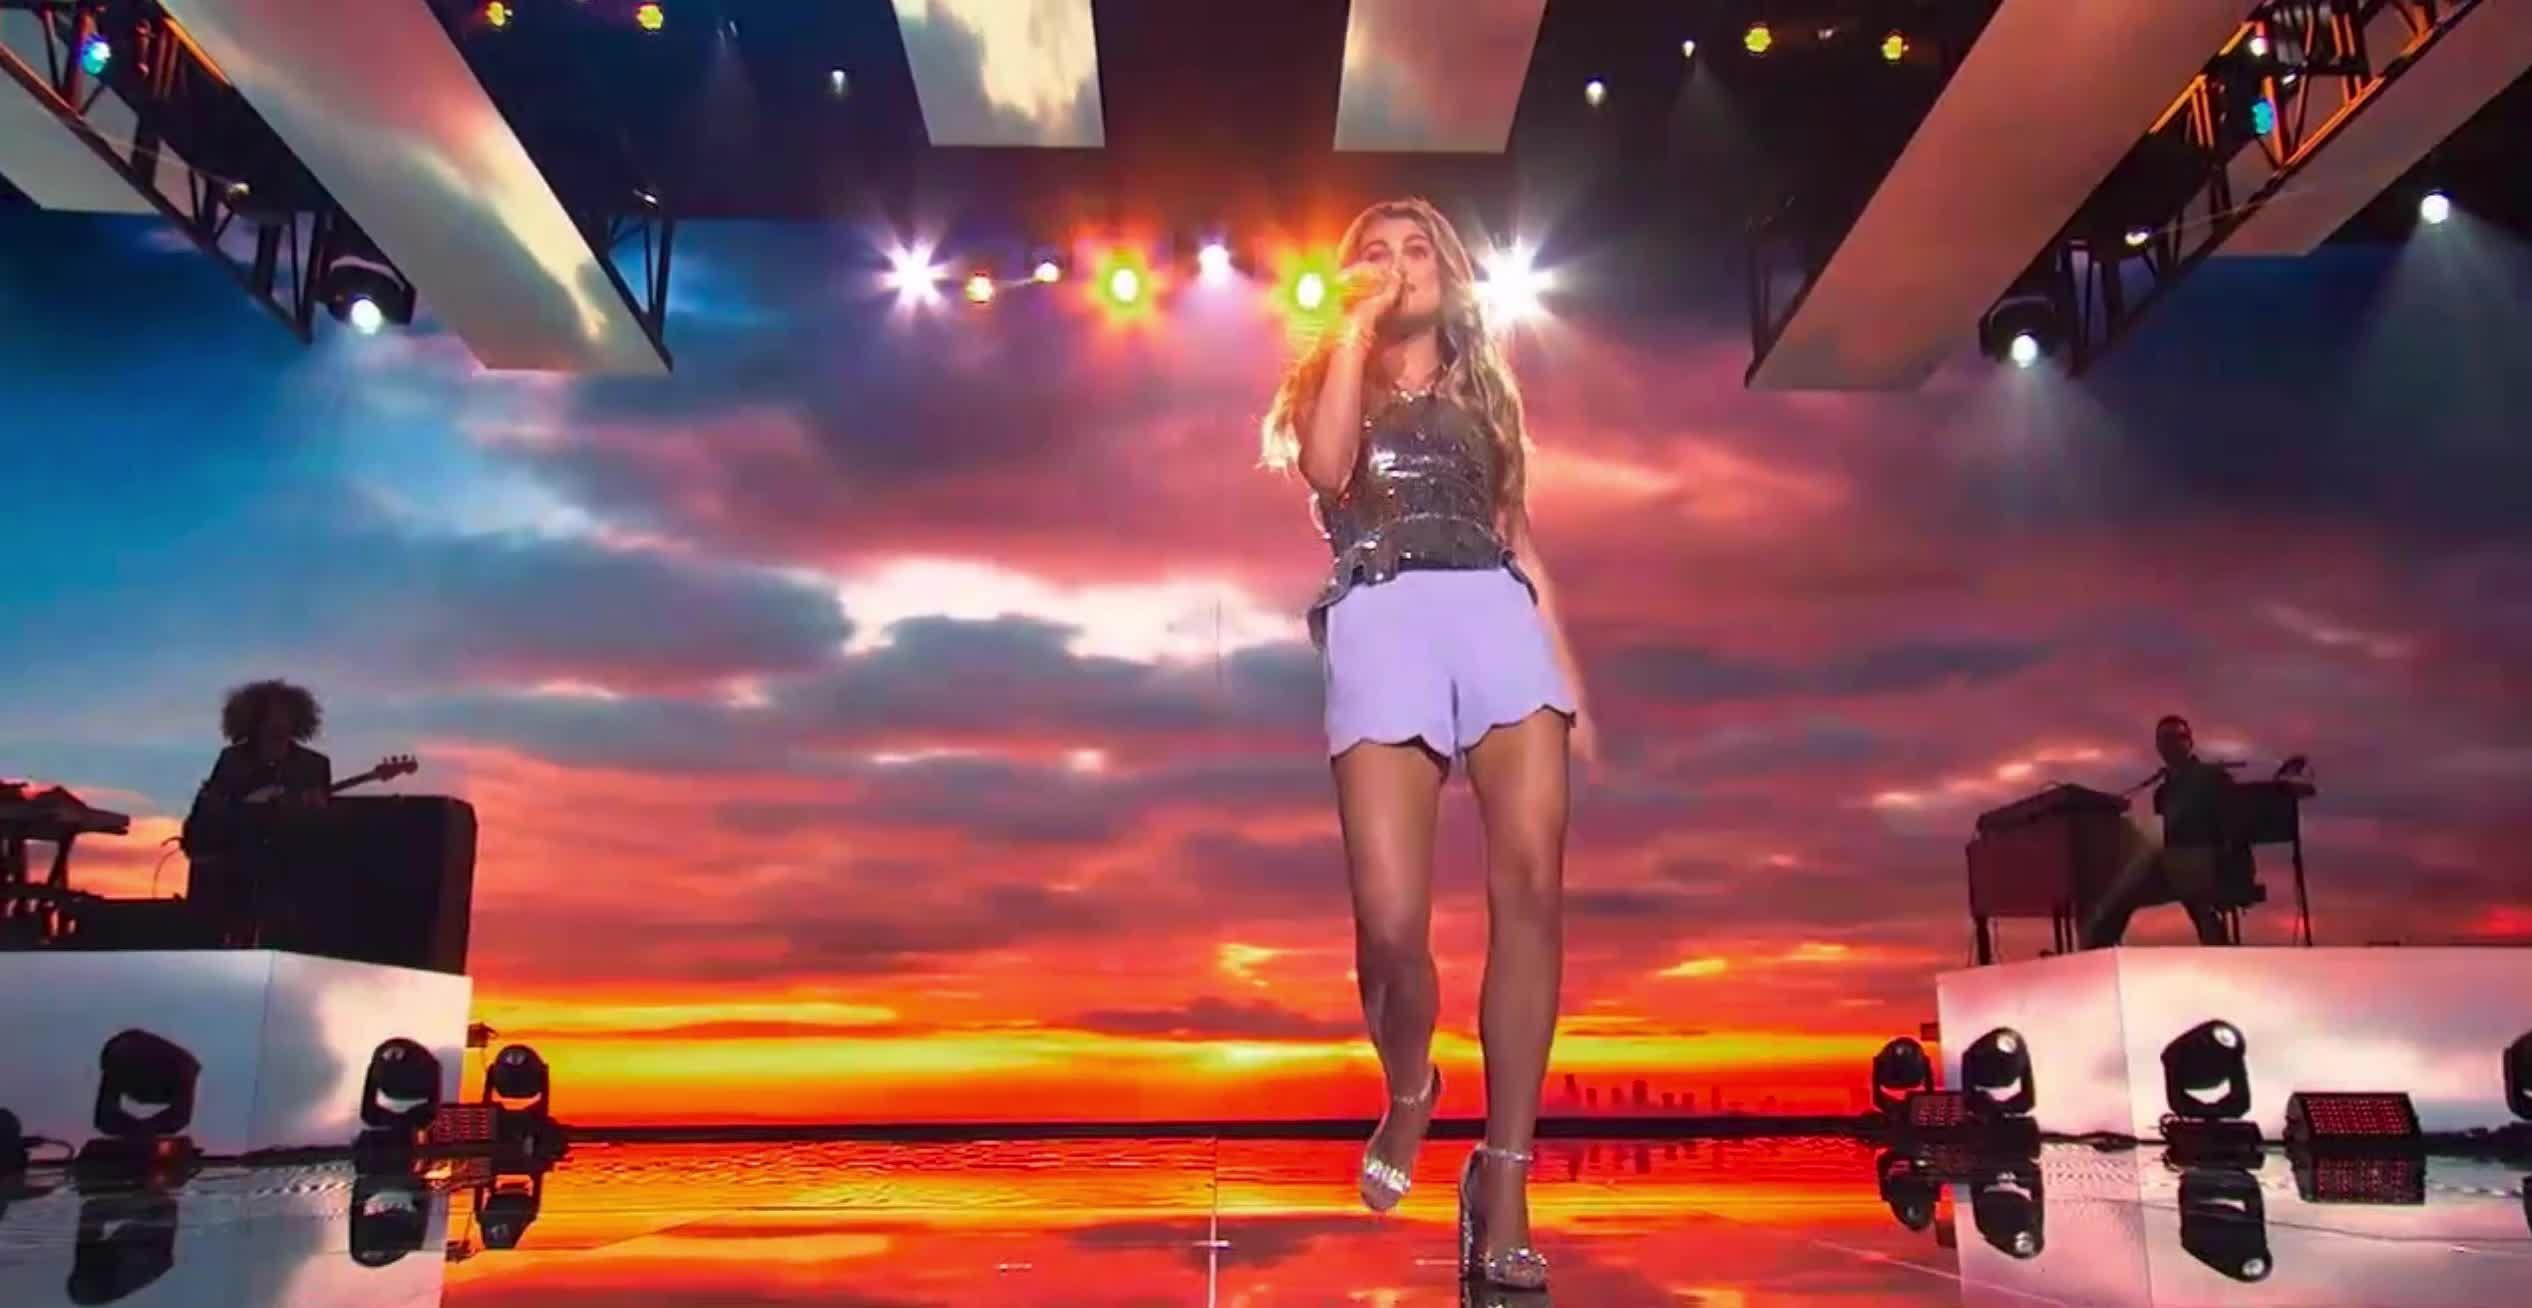 american idol, american idol season 17, americanidol, fabulous, katy perry, lionel richie, luke bryan, riley, riley thompson, ryan seacrest, sassy, season 17, American Idol Riley Sassy and Fabulous GIFs